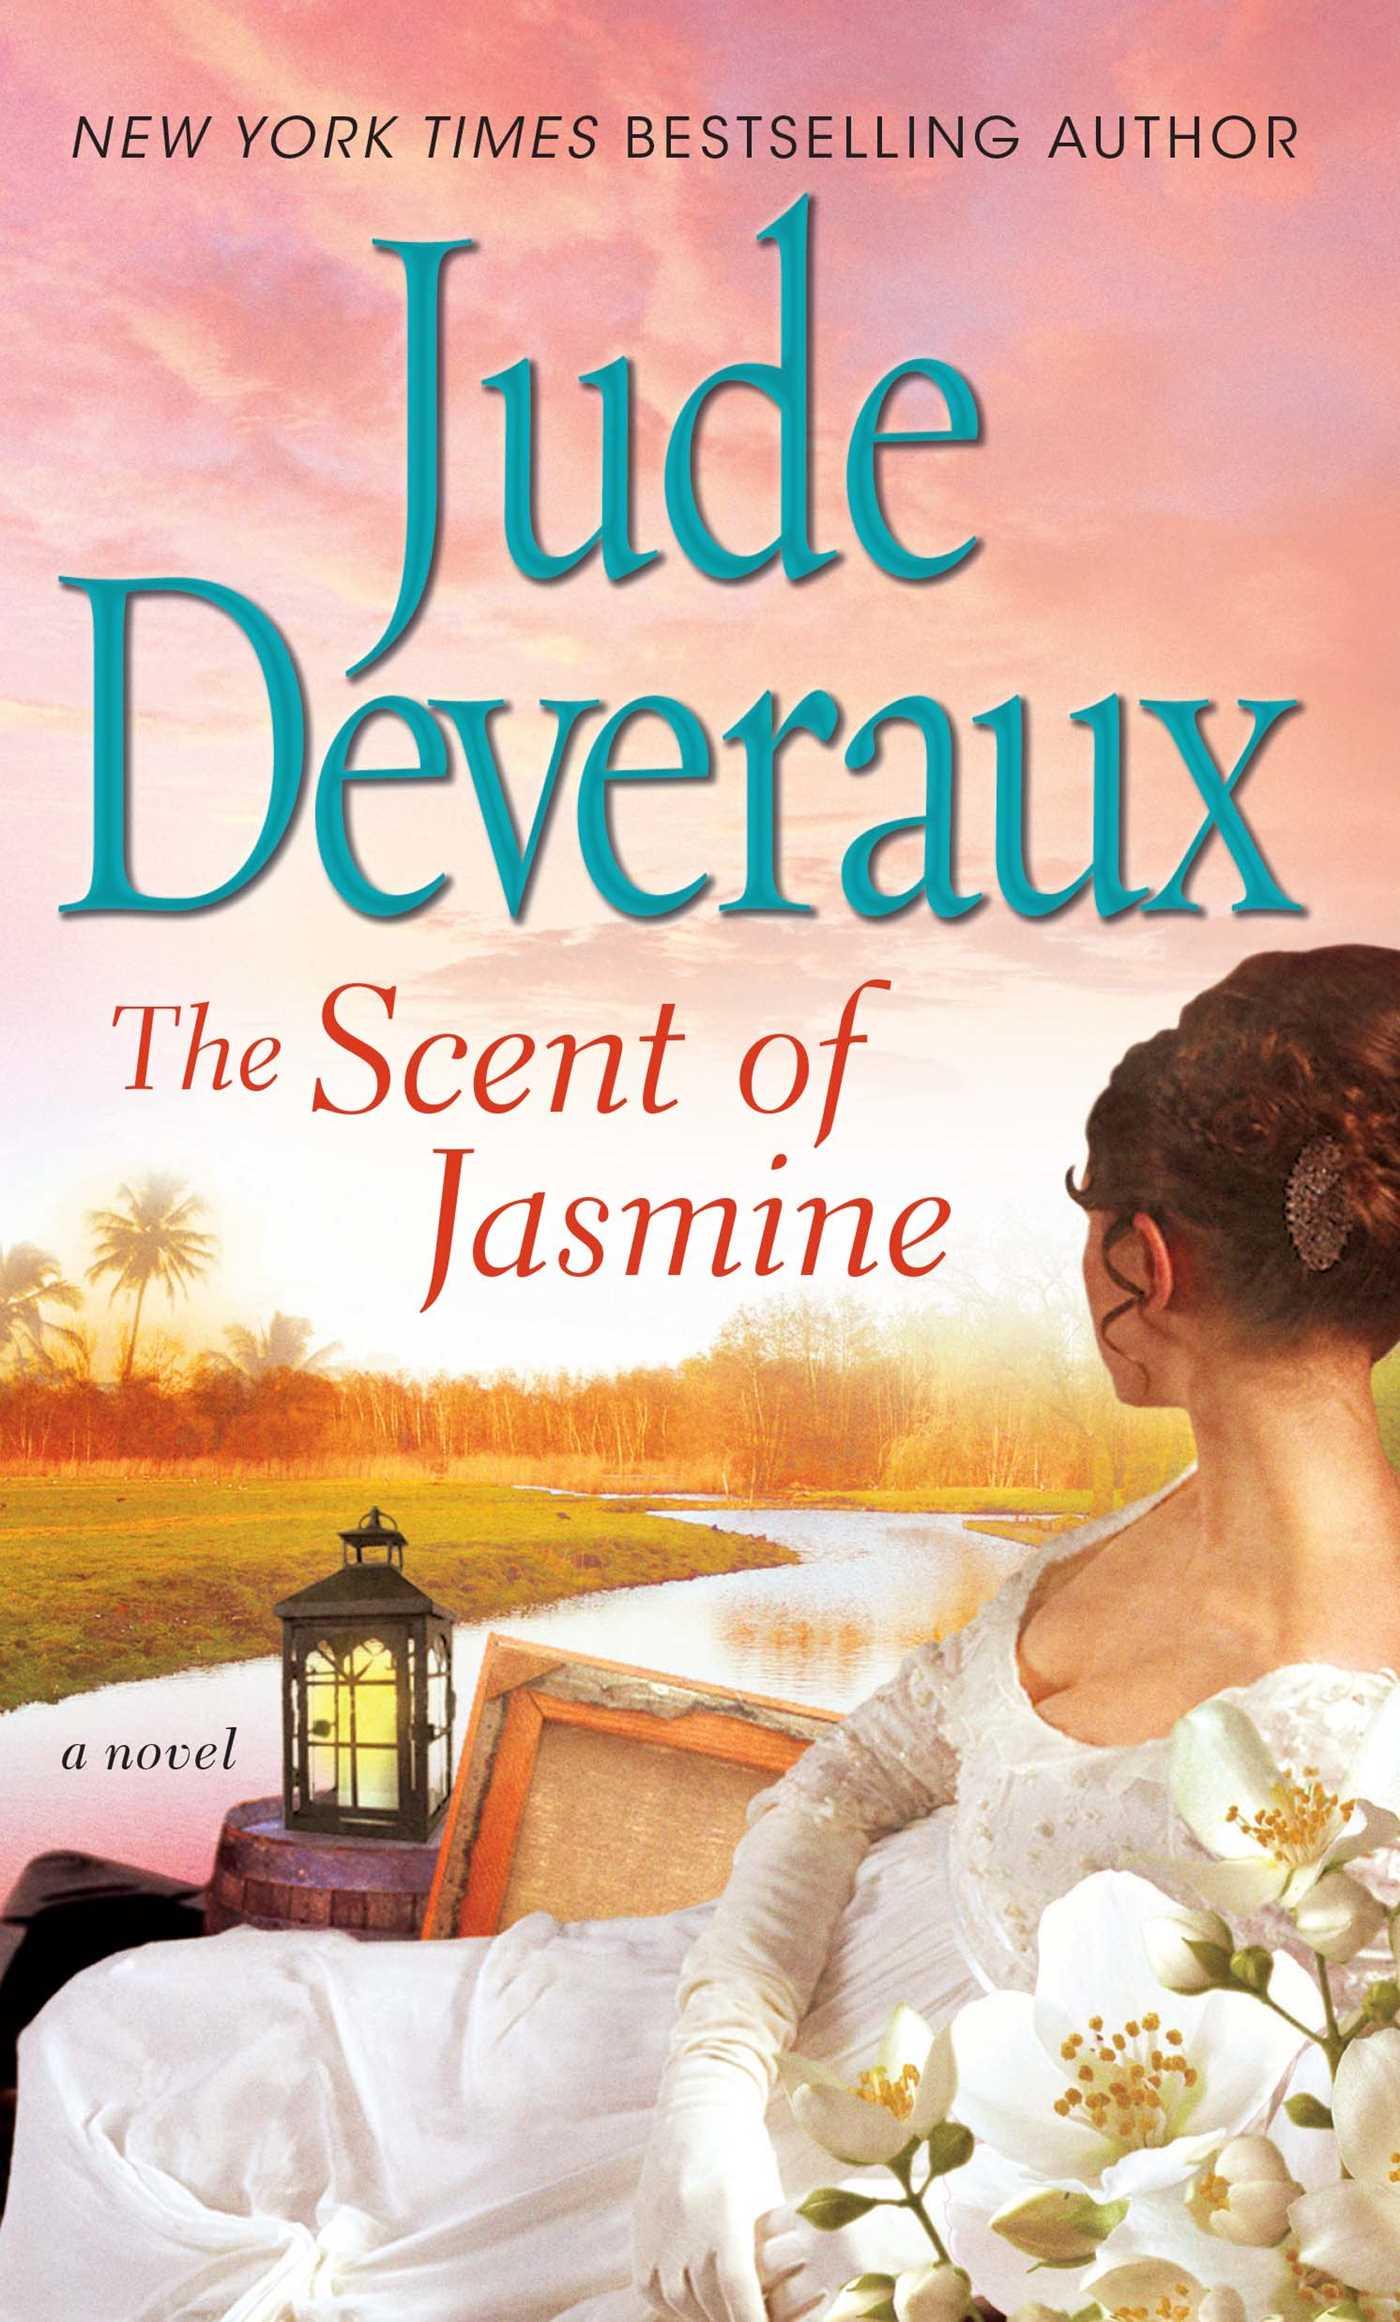 The Scent of Jasmine